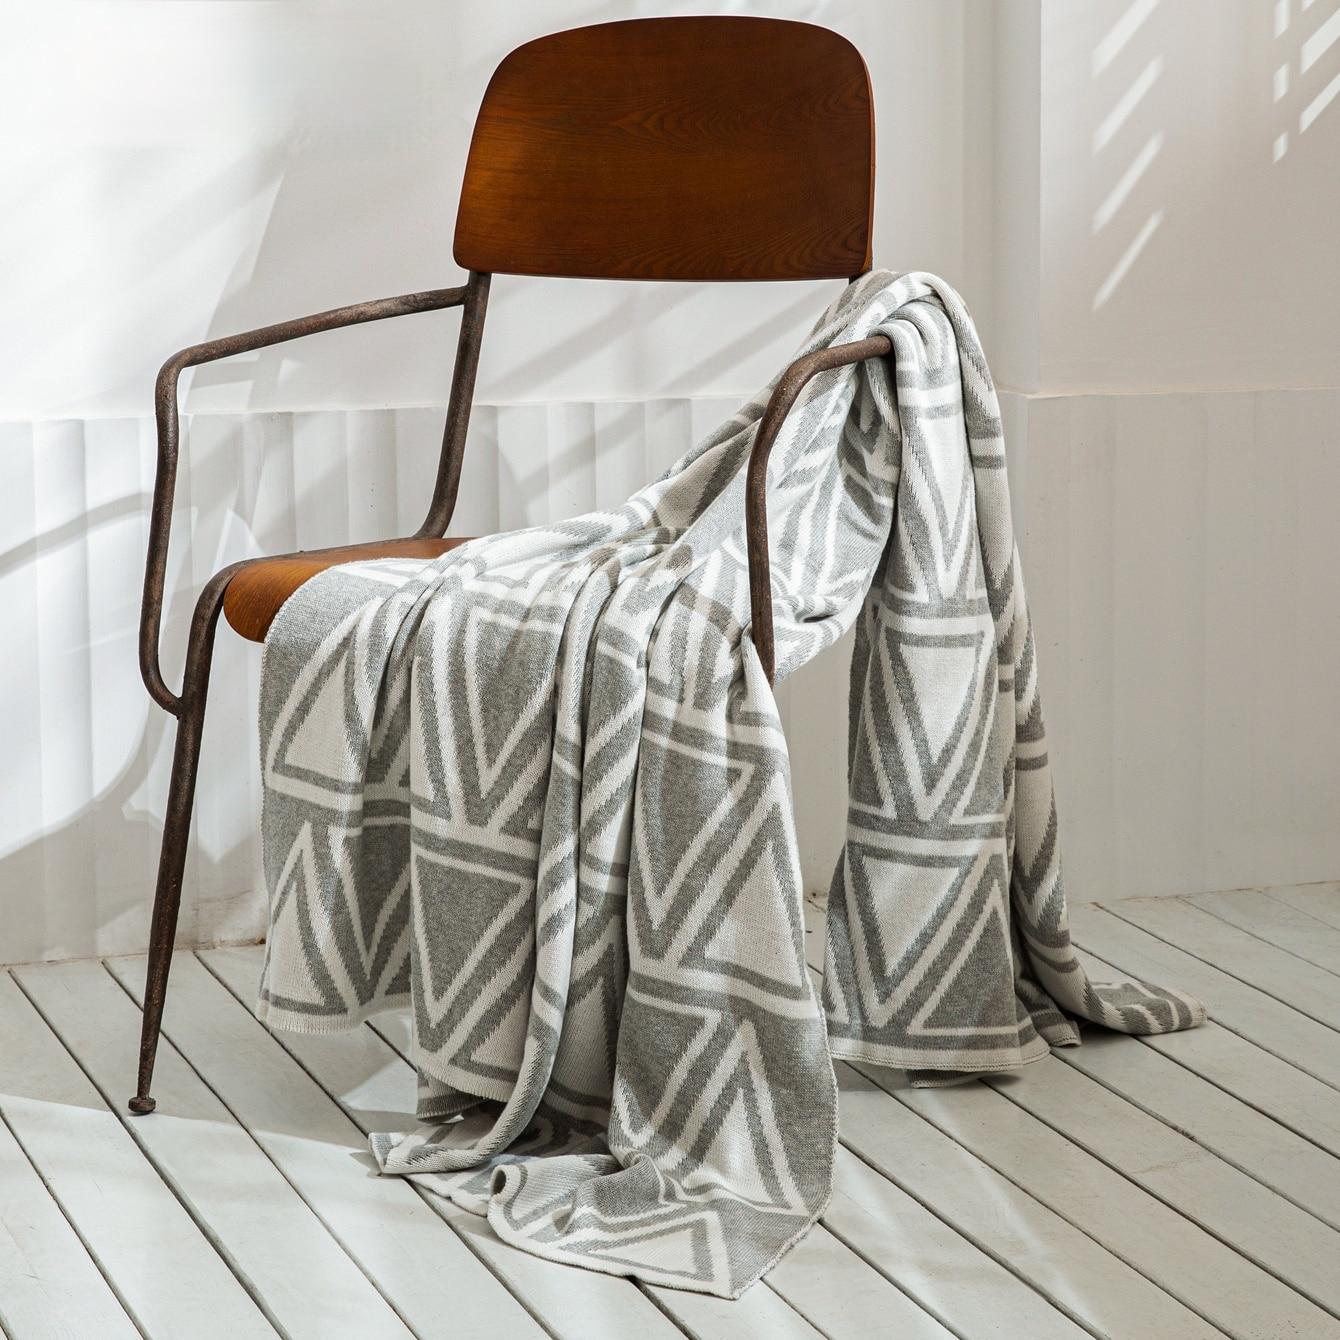 YIRUIO حك البطانيات القطن لينة الكلاسيكية رمادي أسود أبيض مثلثات نمط أريكة منقوشة رمي بطانية لبس سرير سفر يلقي